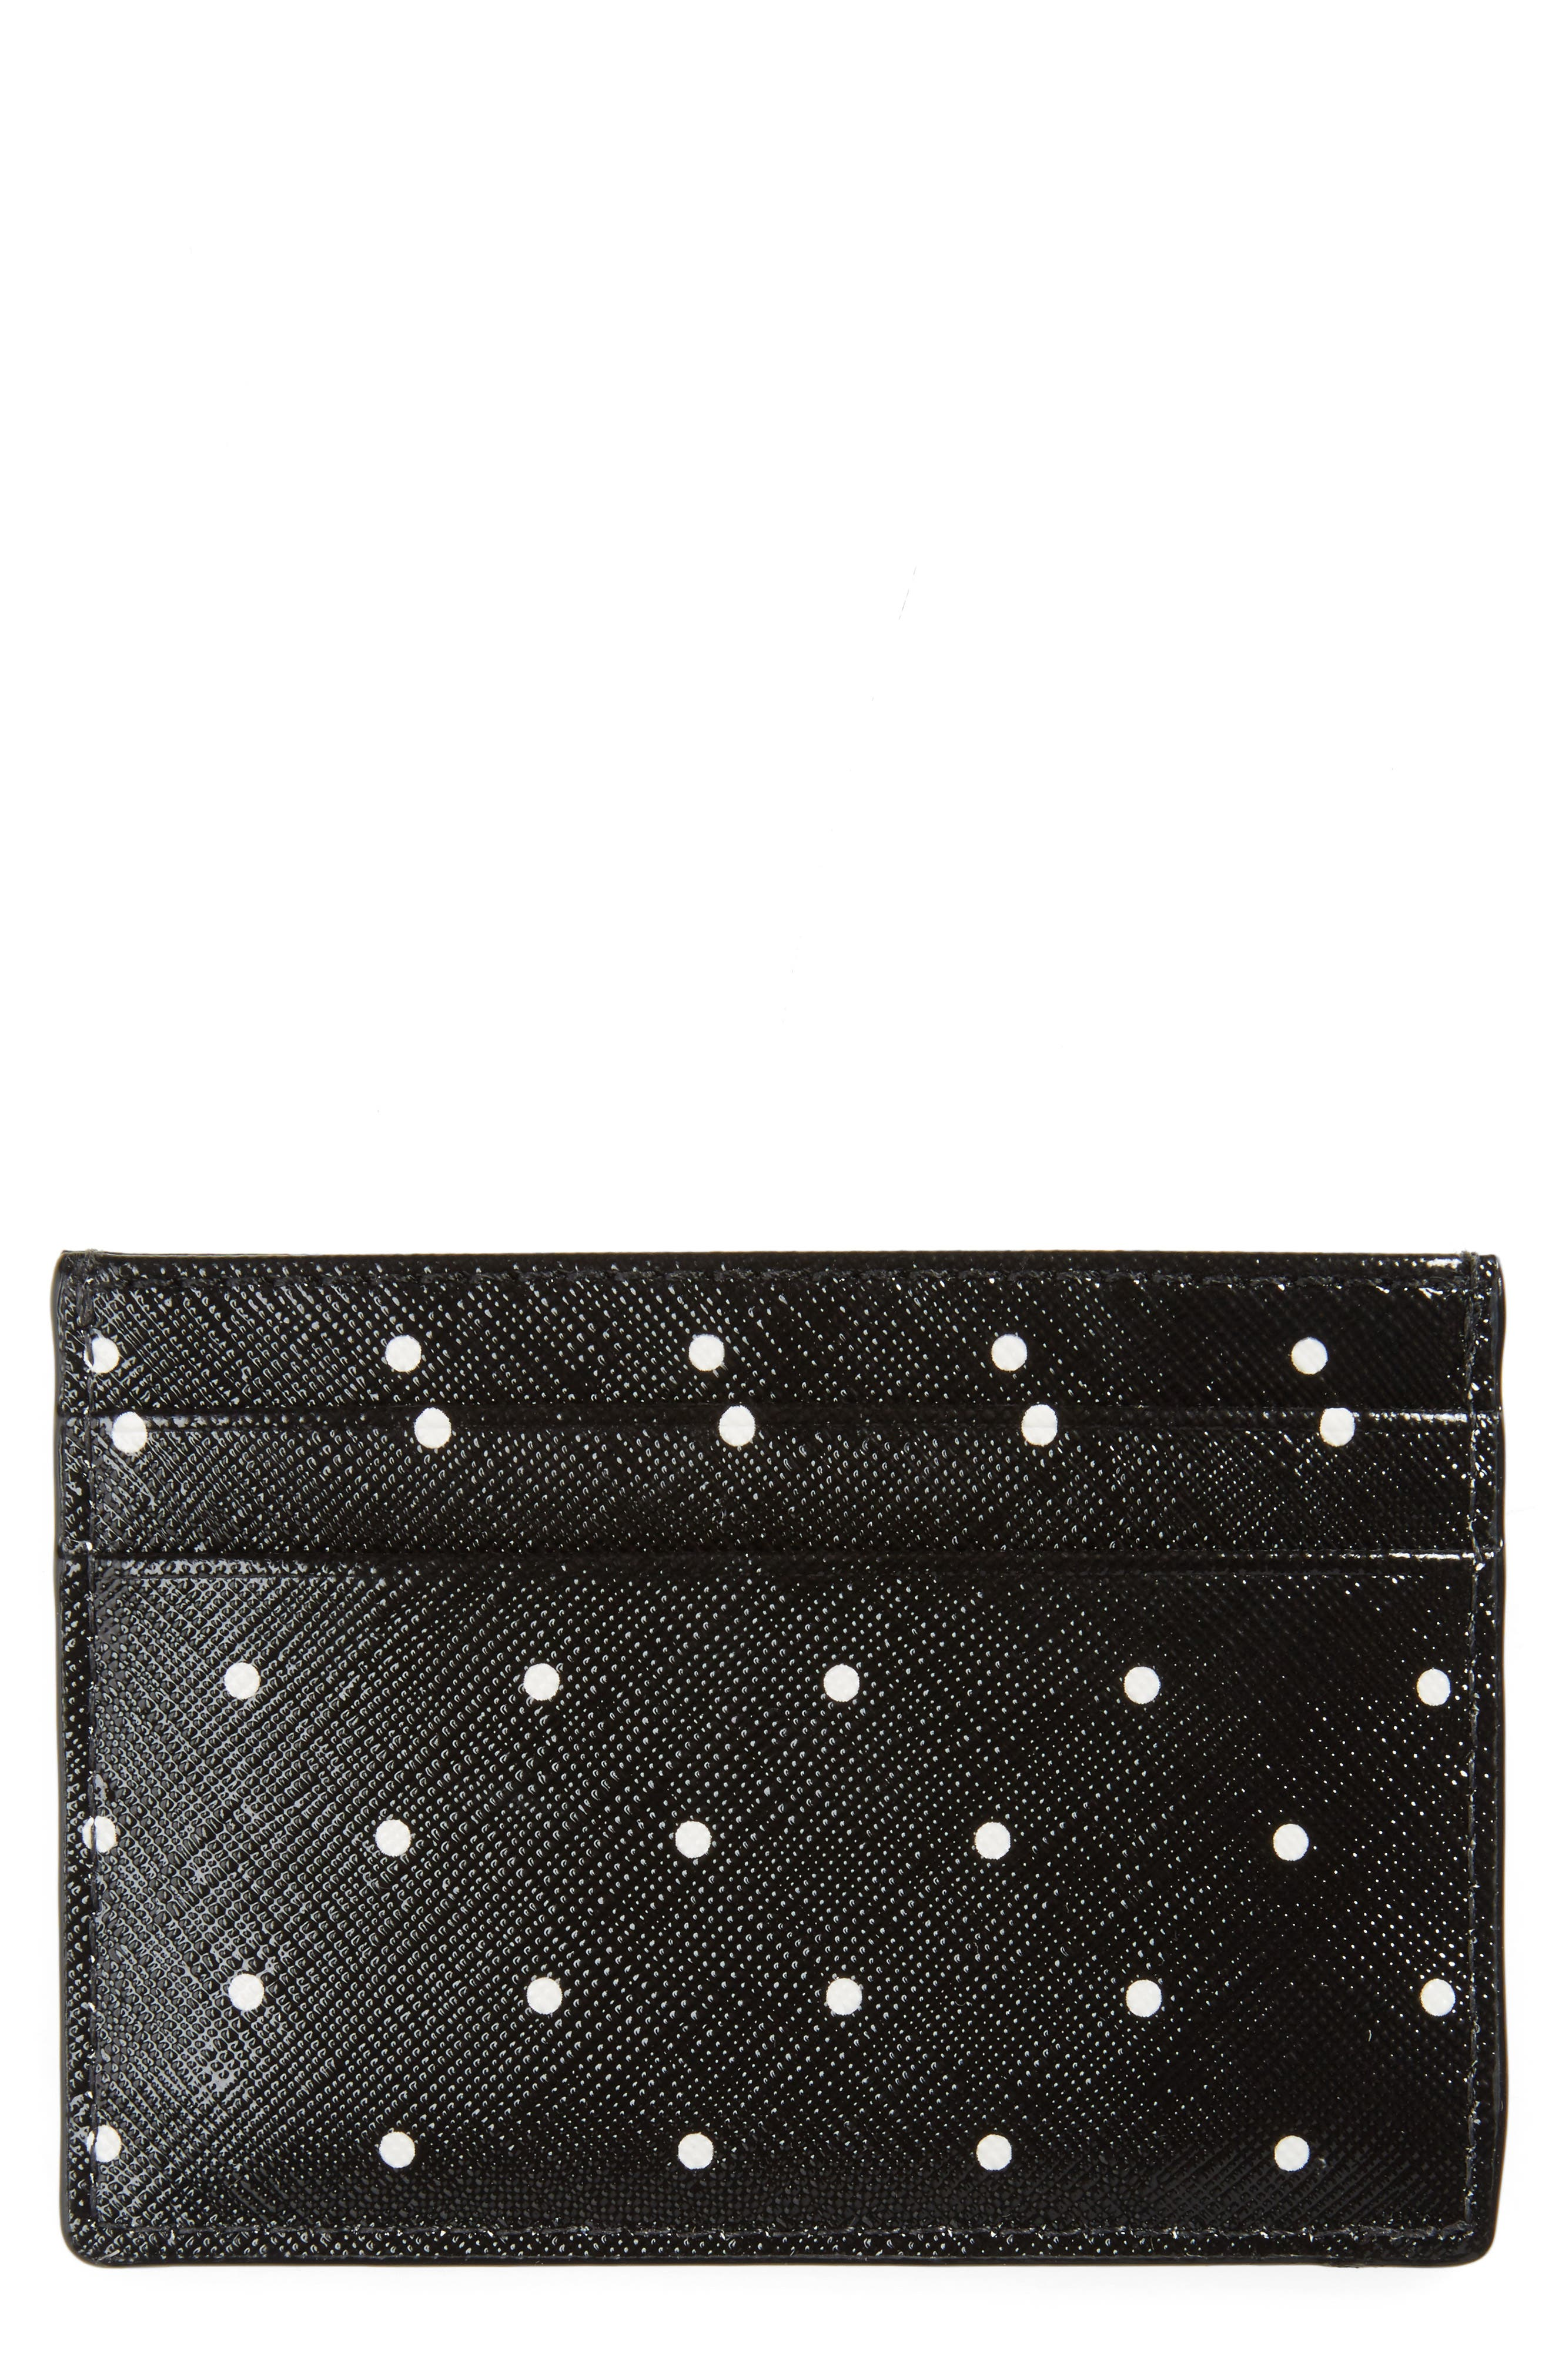 brooks drive card case,                             Main thumbnail 1, color,                             Black/ Cream